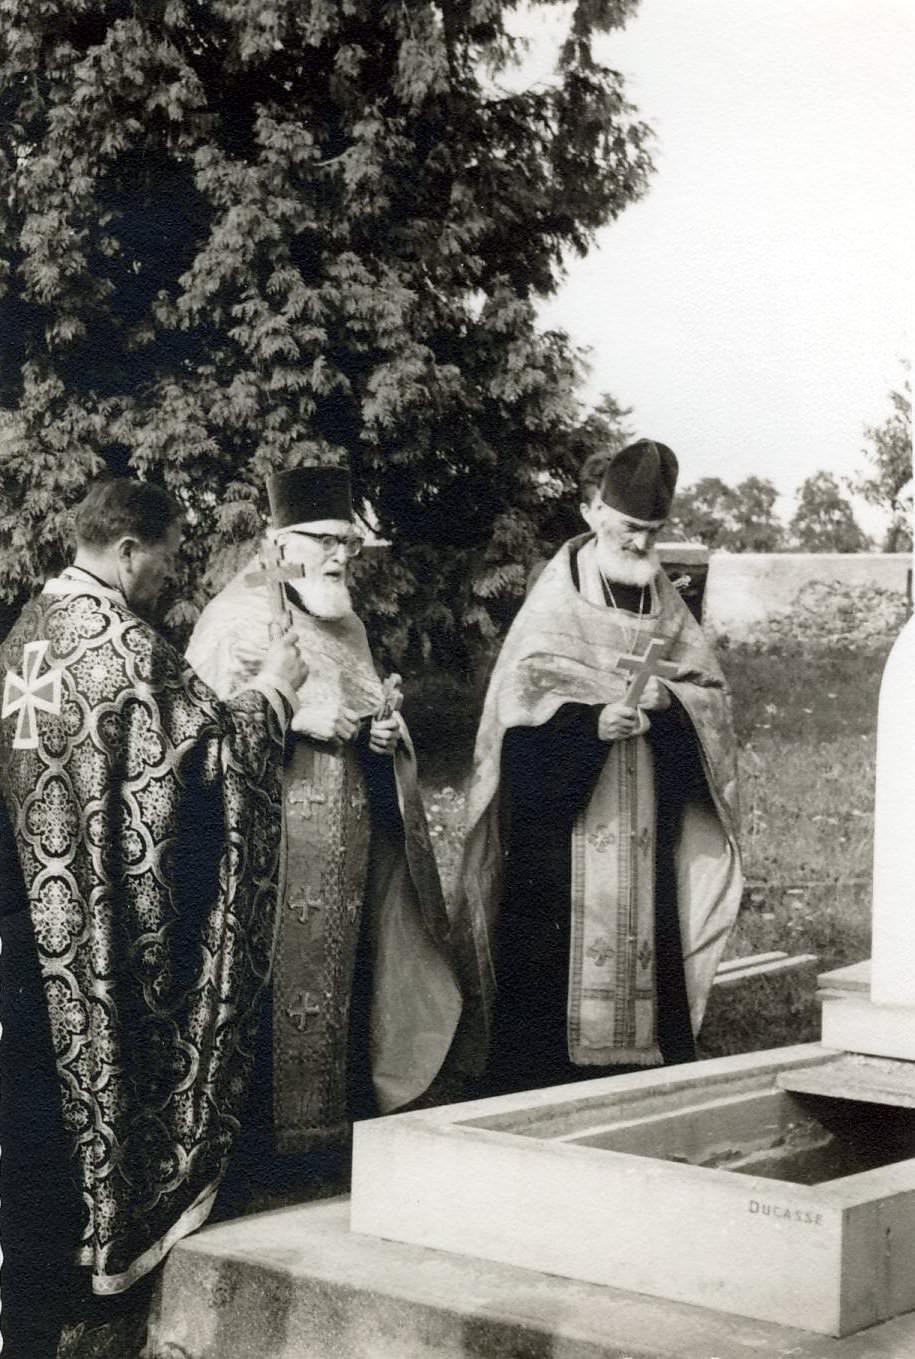 Mitropolitul Visarion Puiu - cimitirul din  Viels-Maisons (Aisne) hp 2